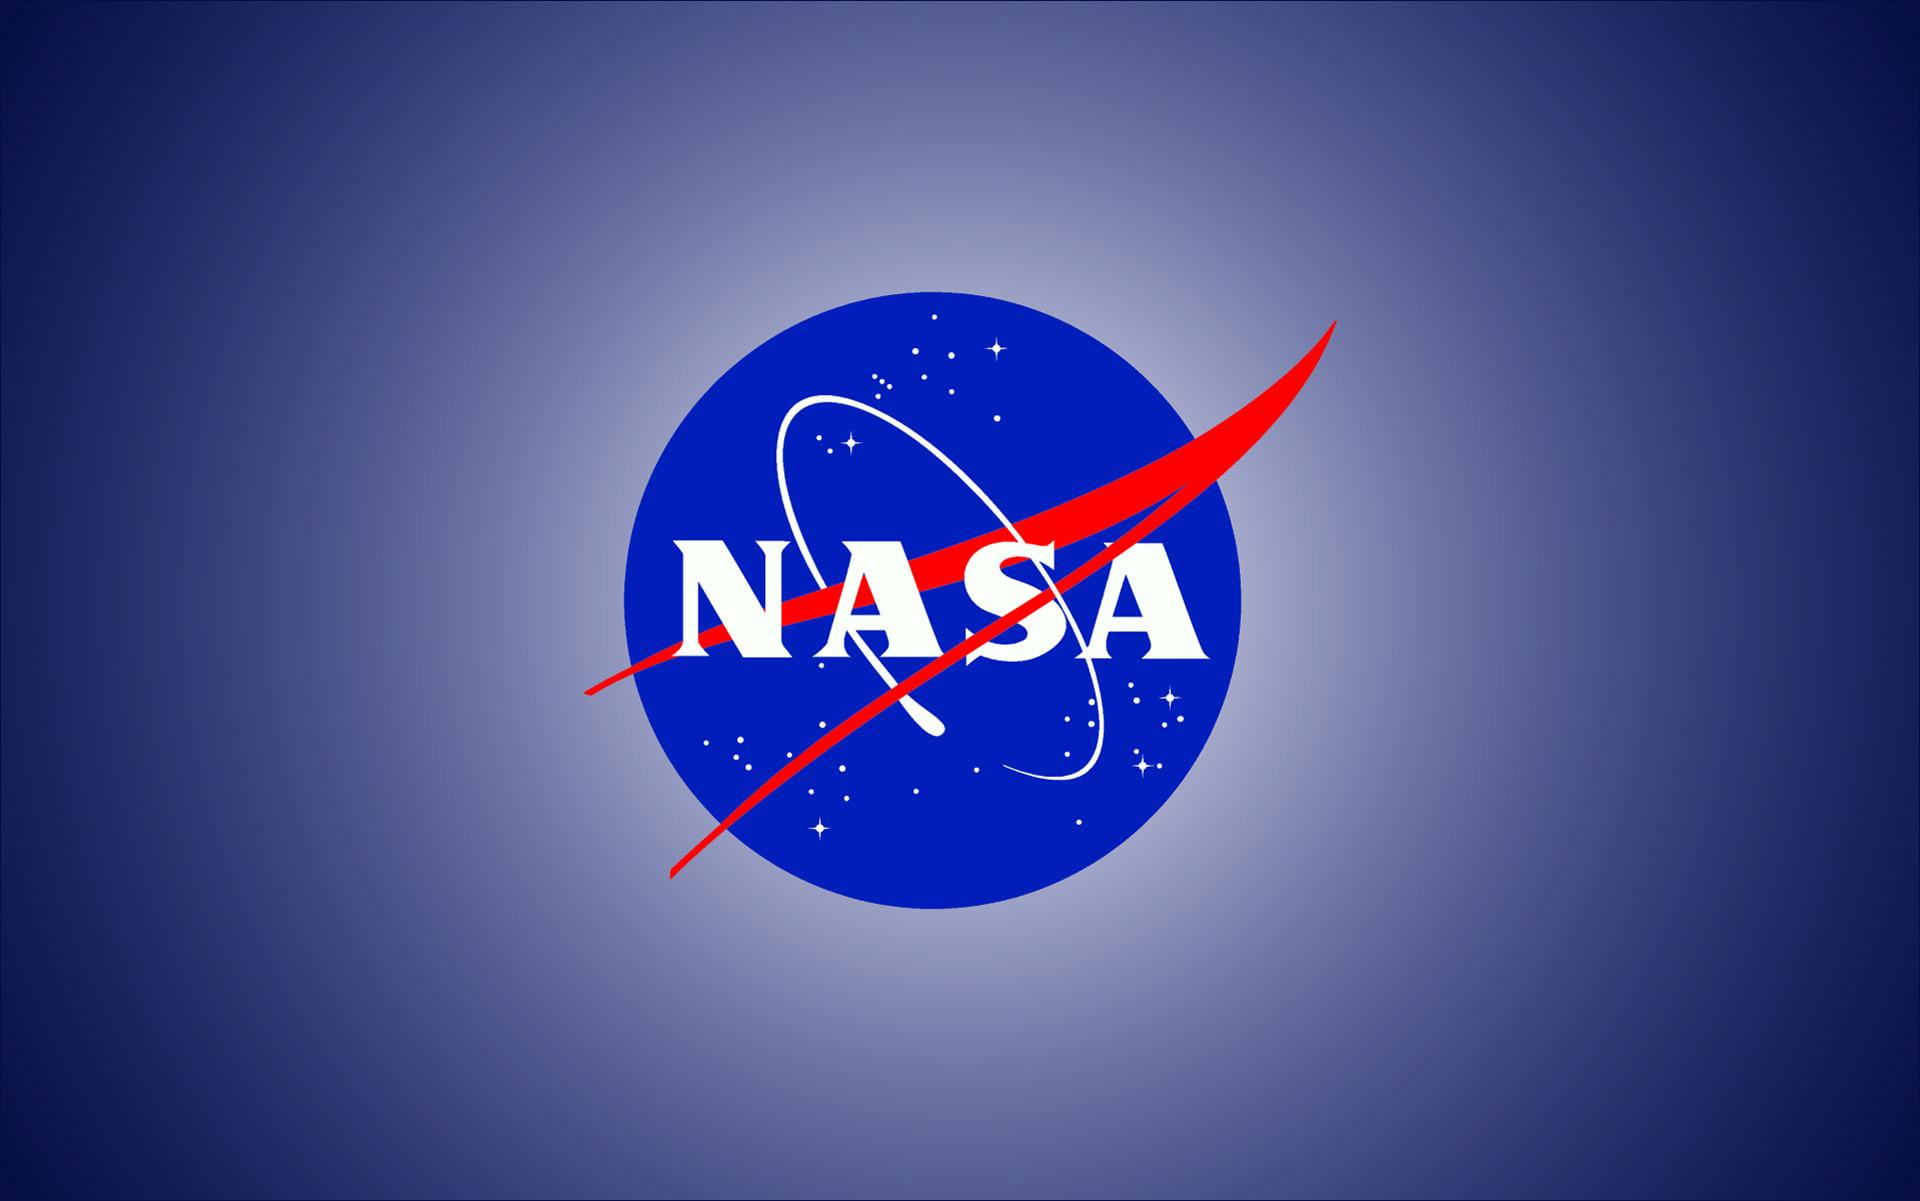 nasa desktop logo - HD1920×1201